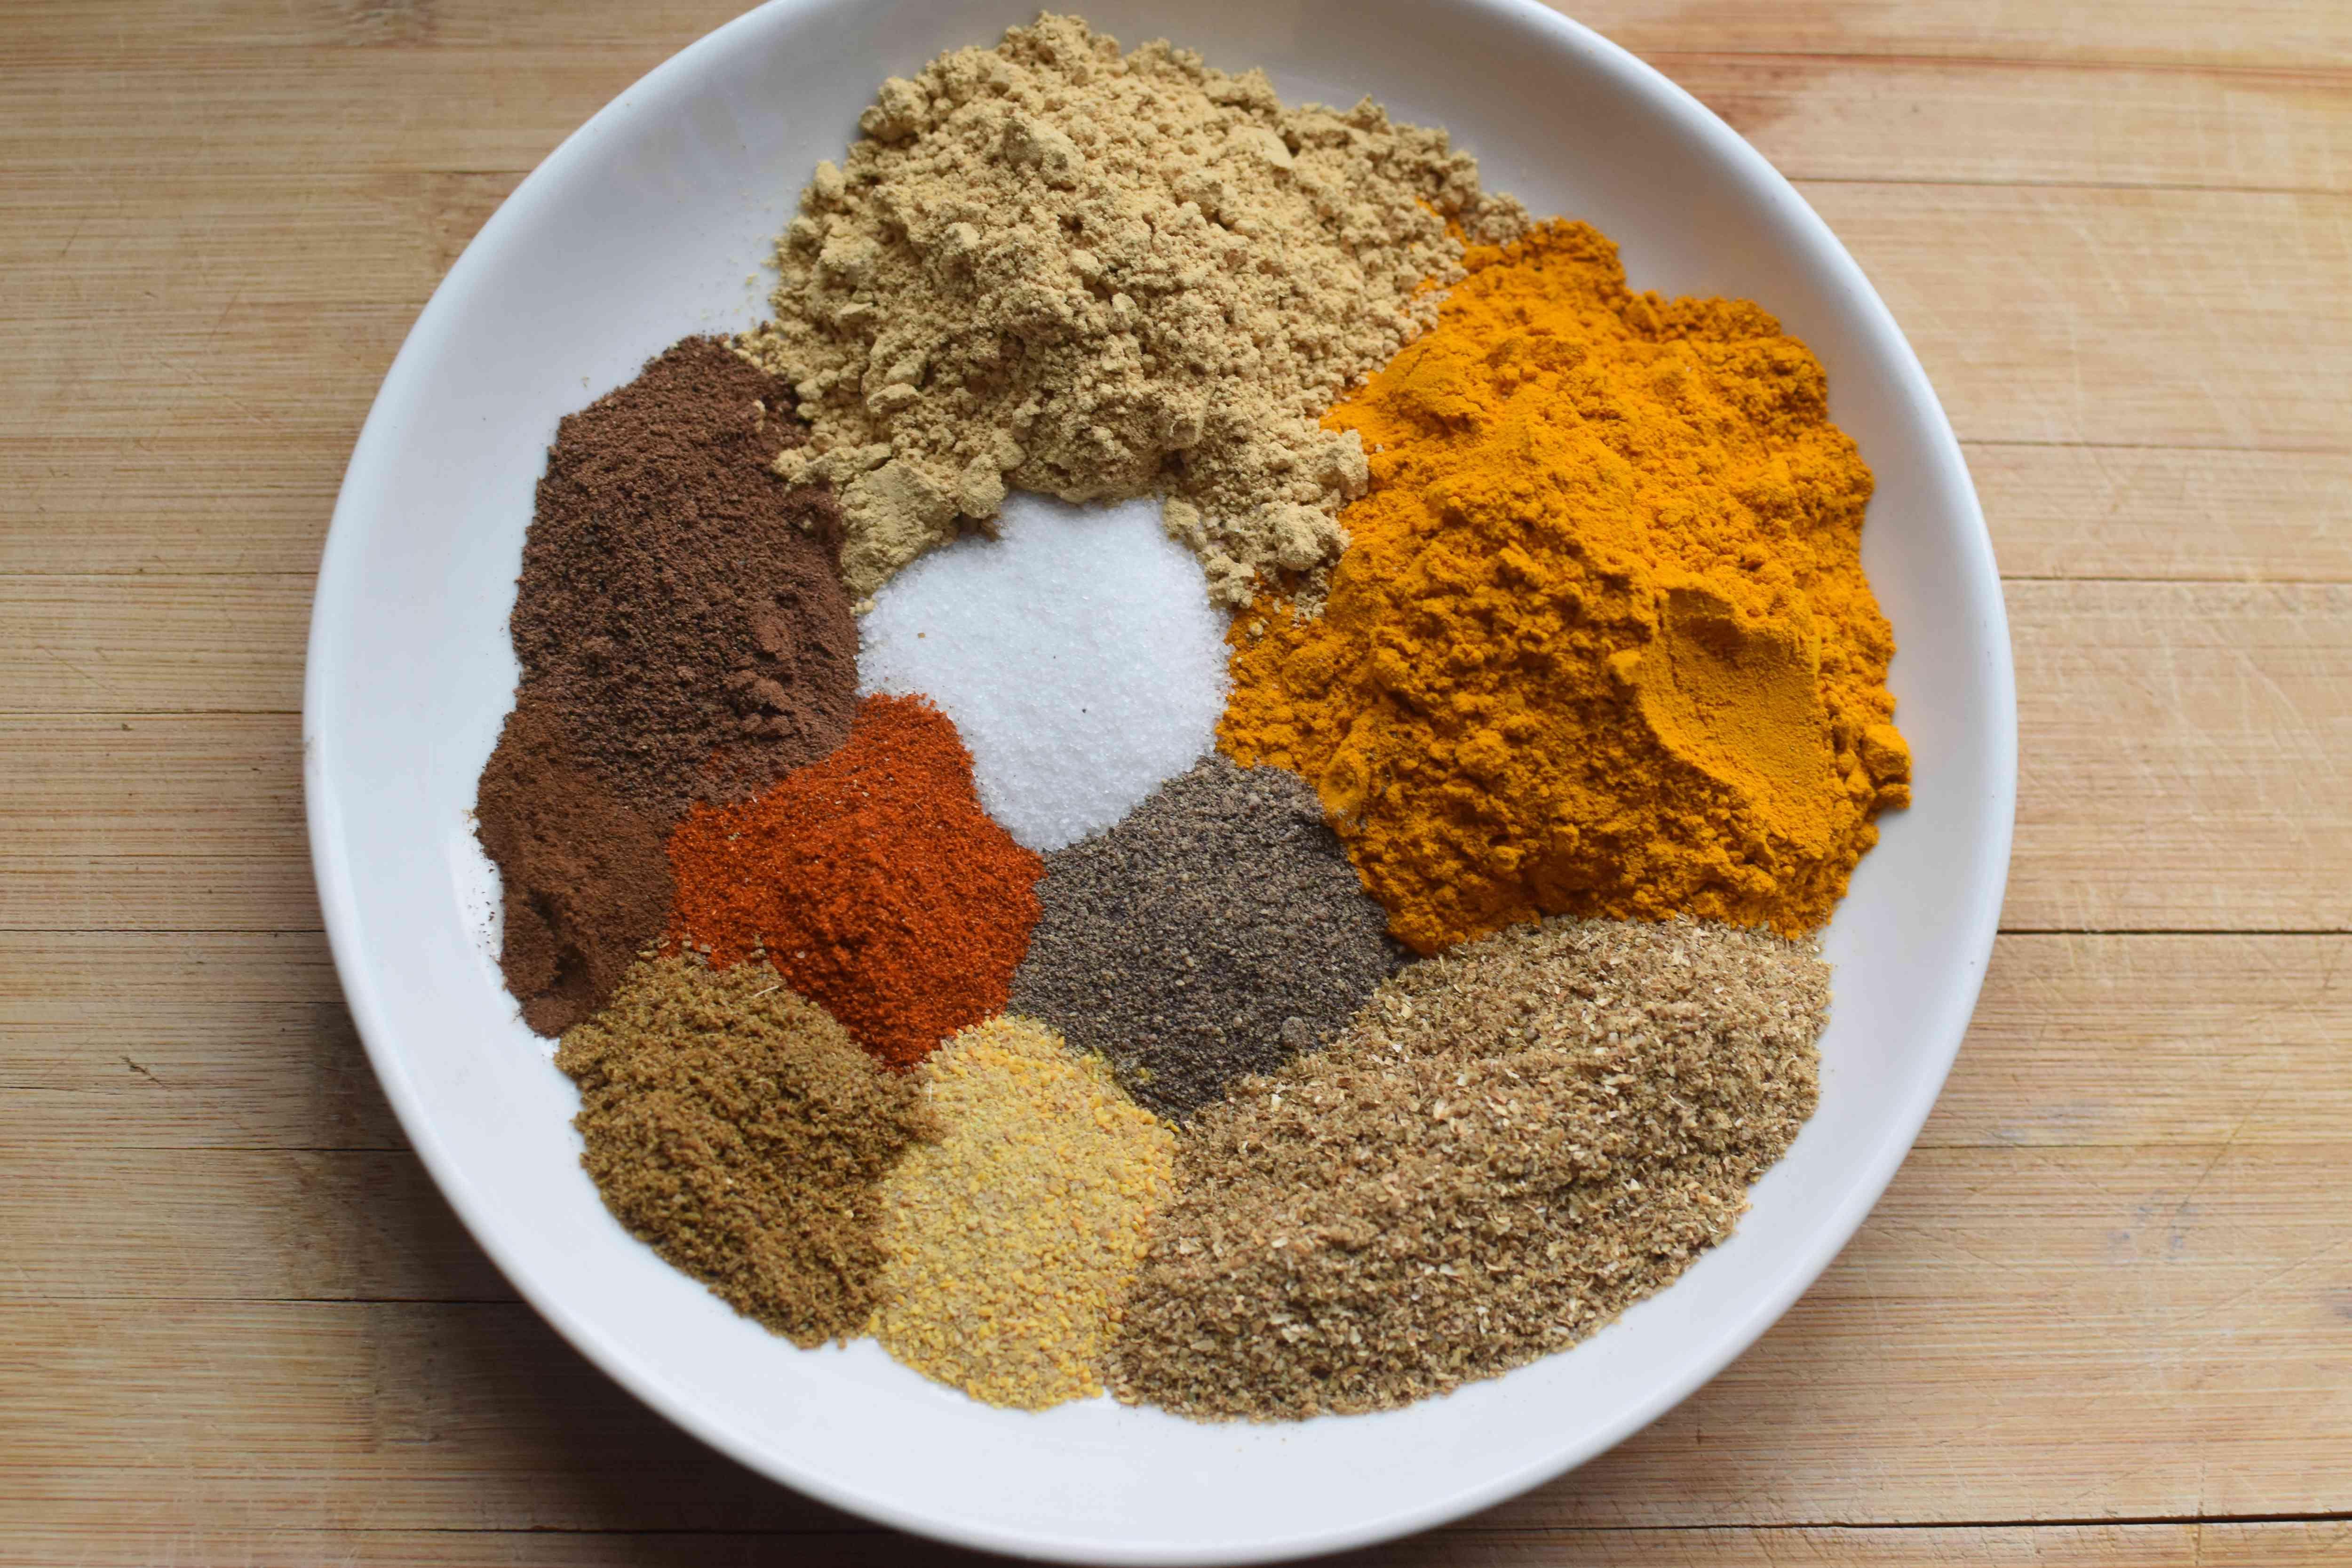 Nigerian Curry Powder ingredients